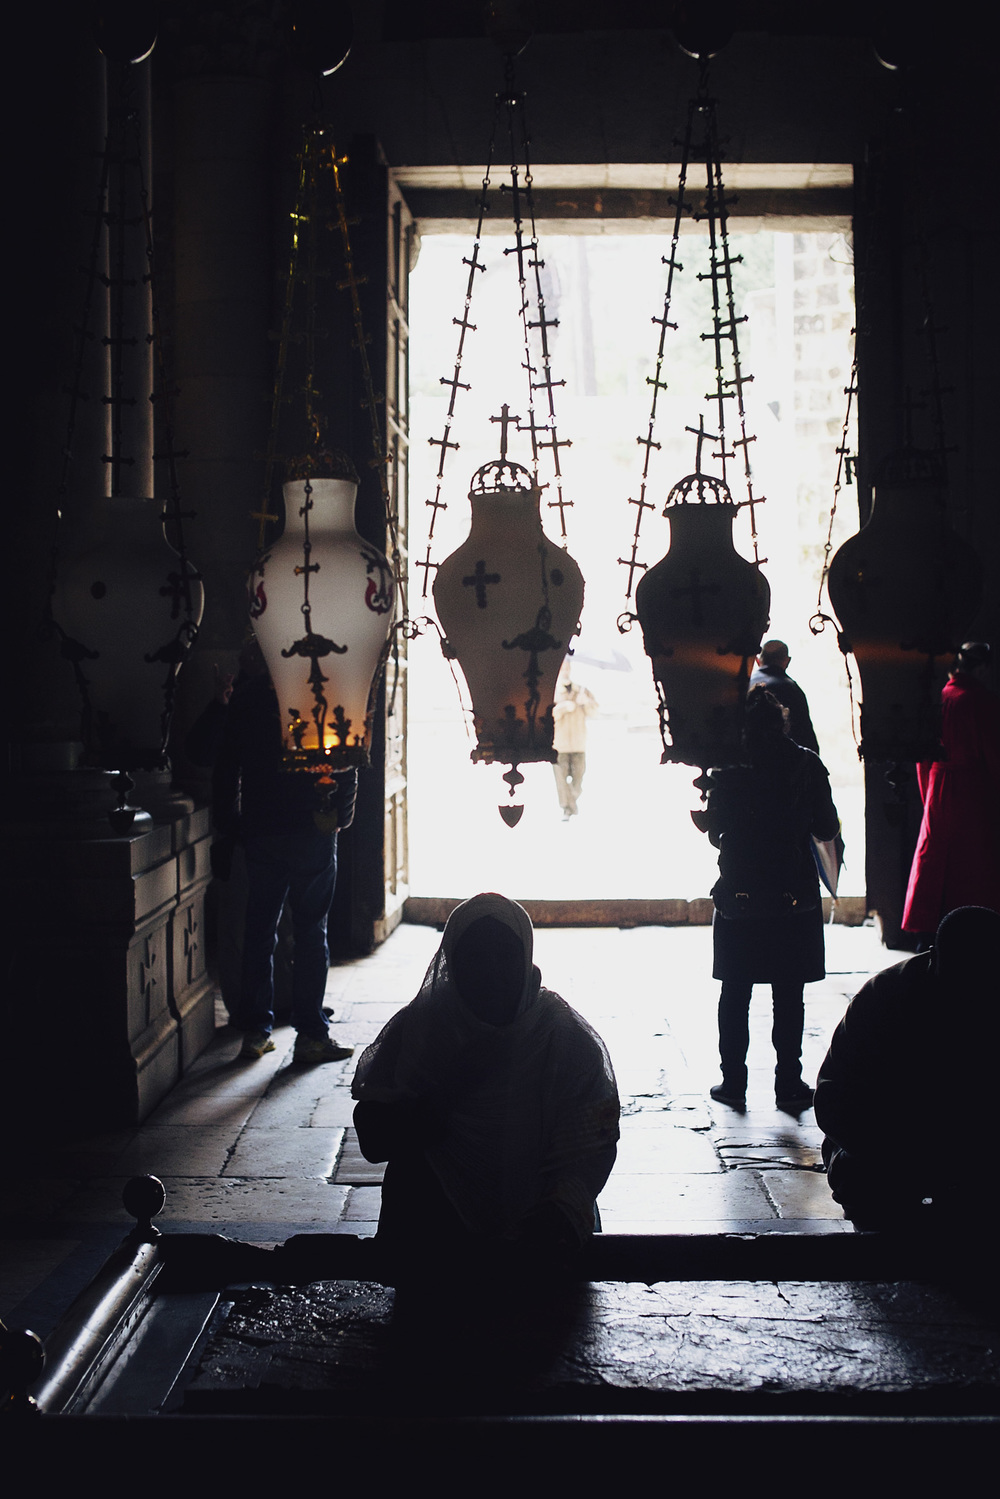 church+of+the+holy+sepulchre.jpg